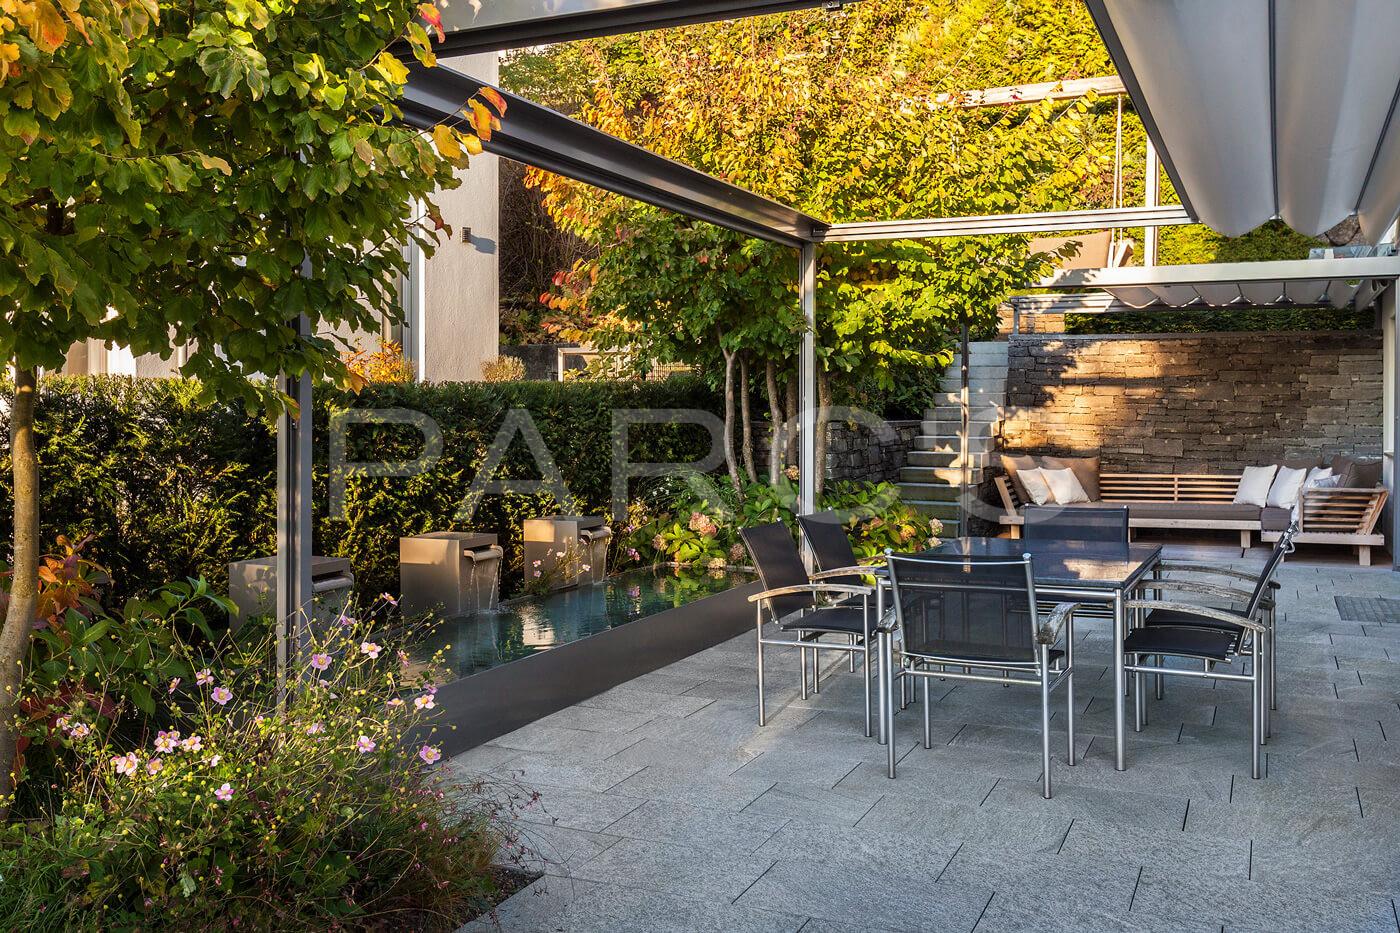 Anemone-hupehensis-Gartengestaltung-2